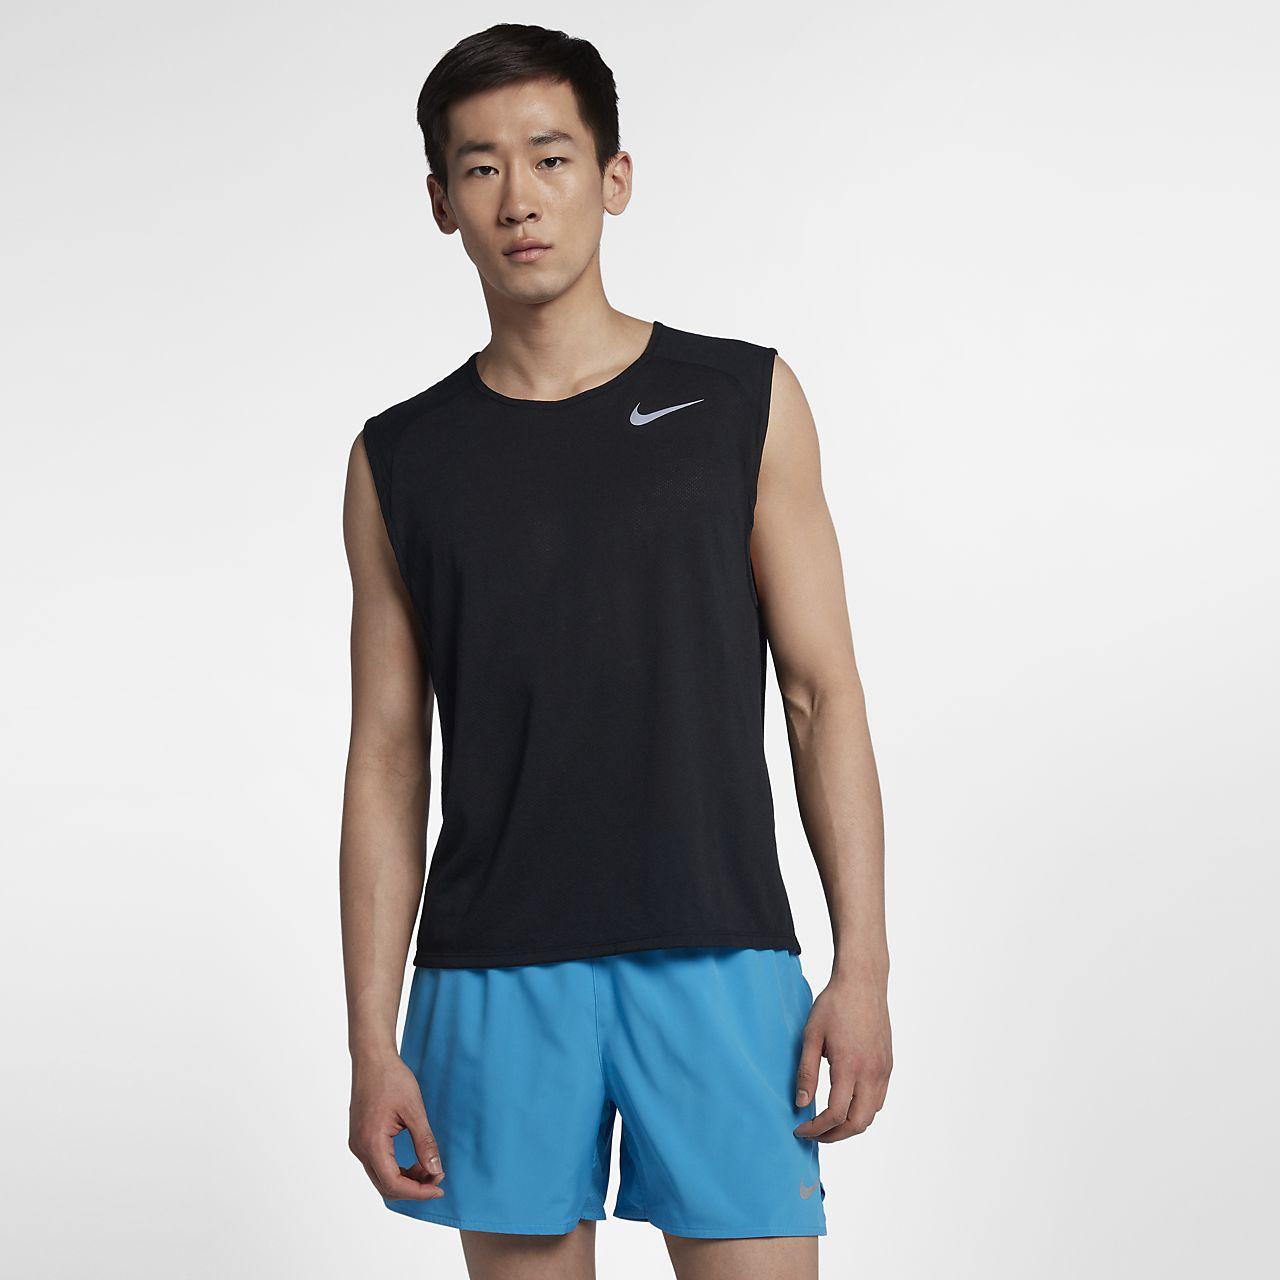 05a41c40b928ac Nike Rise 365 Men s Sleeveless Running Top. Nike.com GB